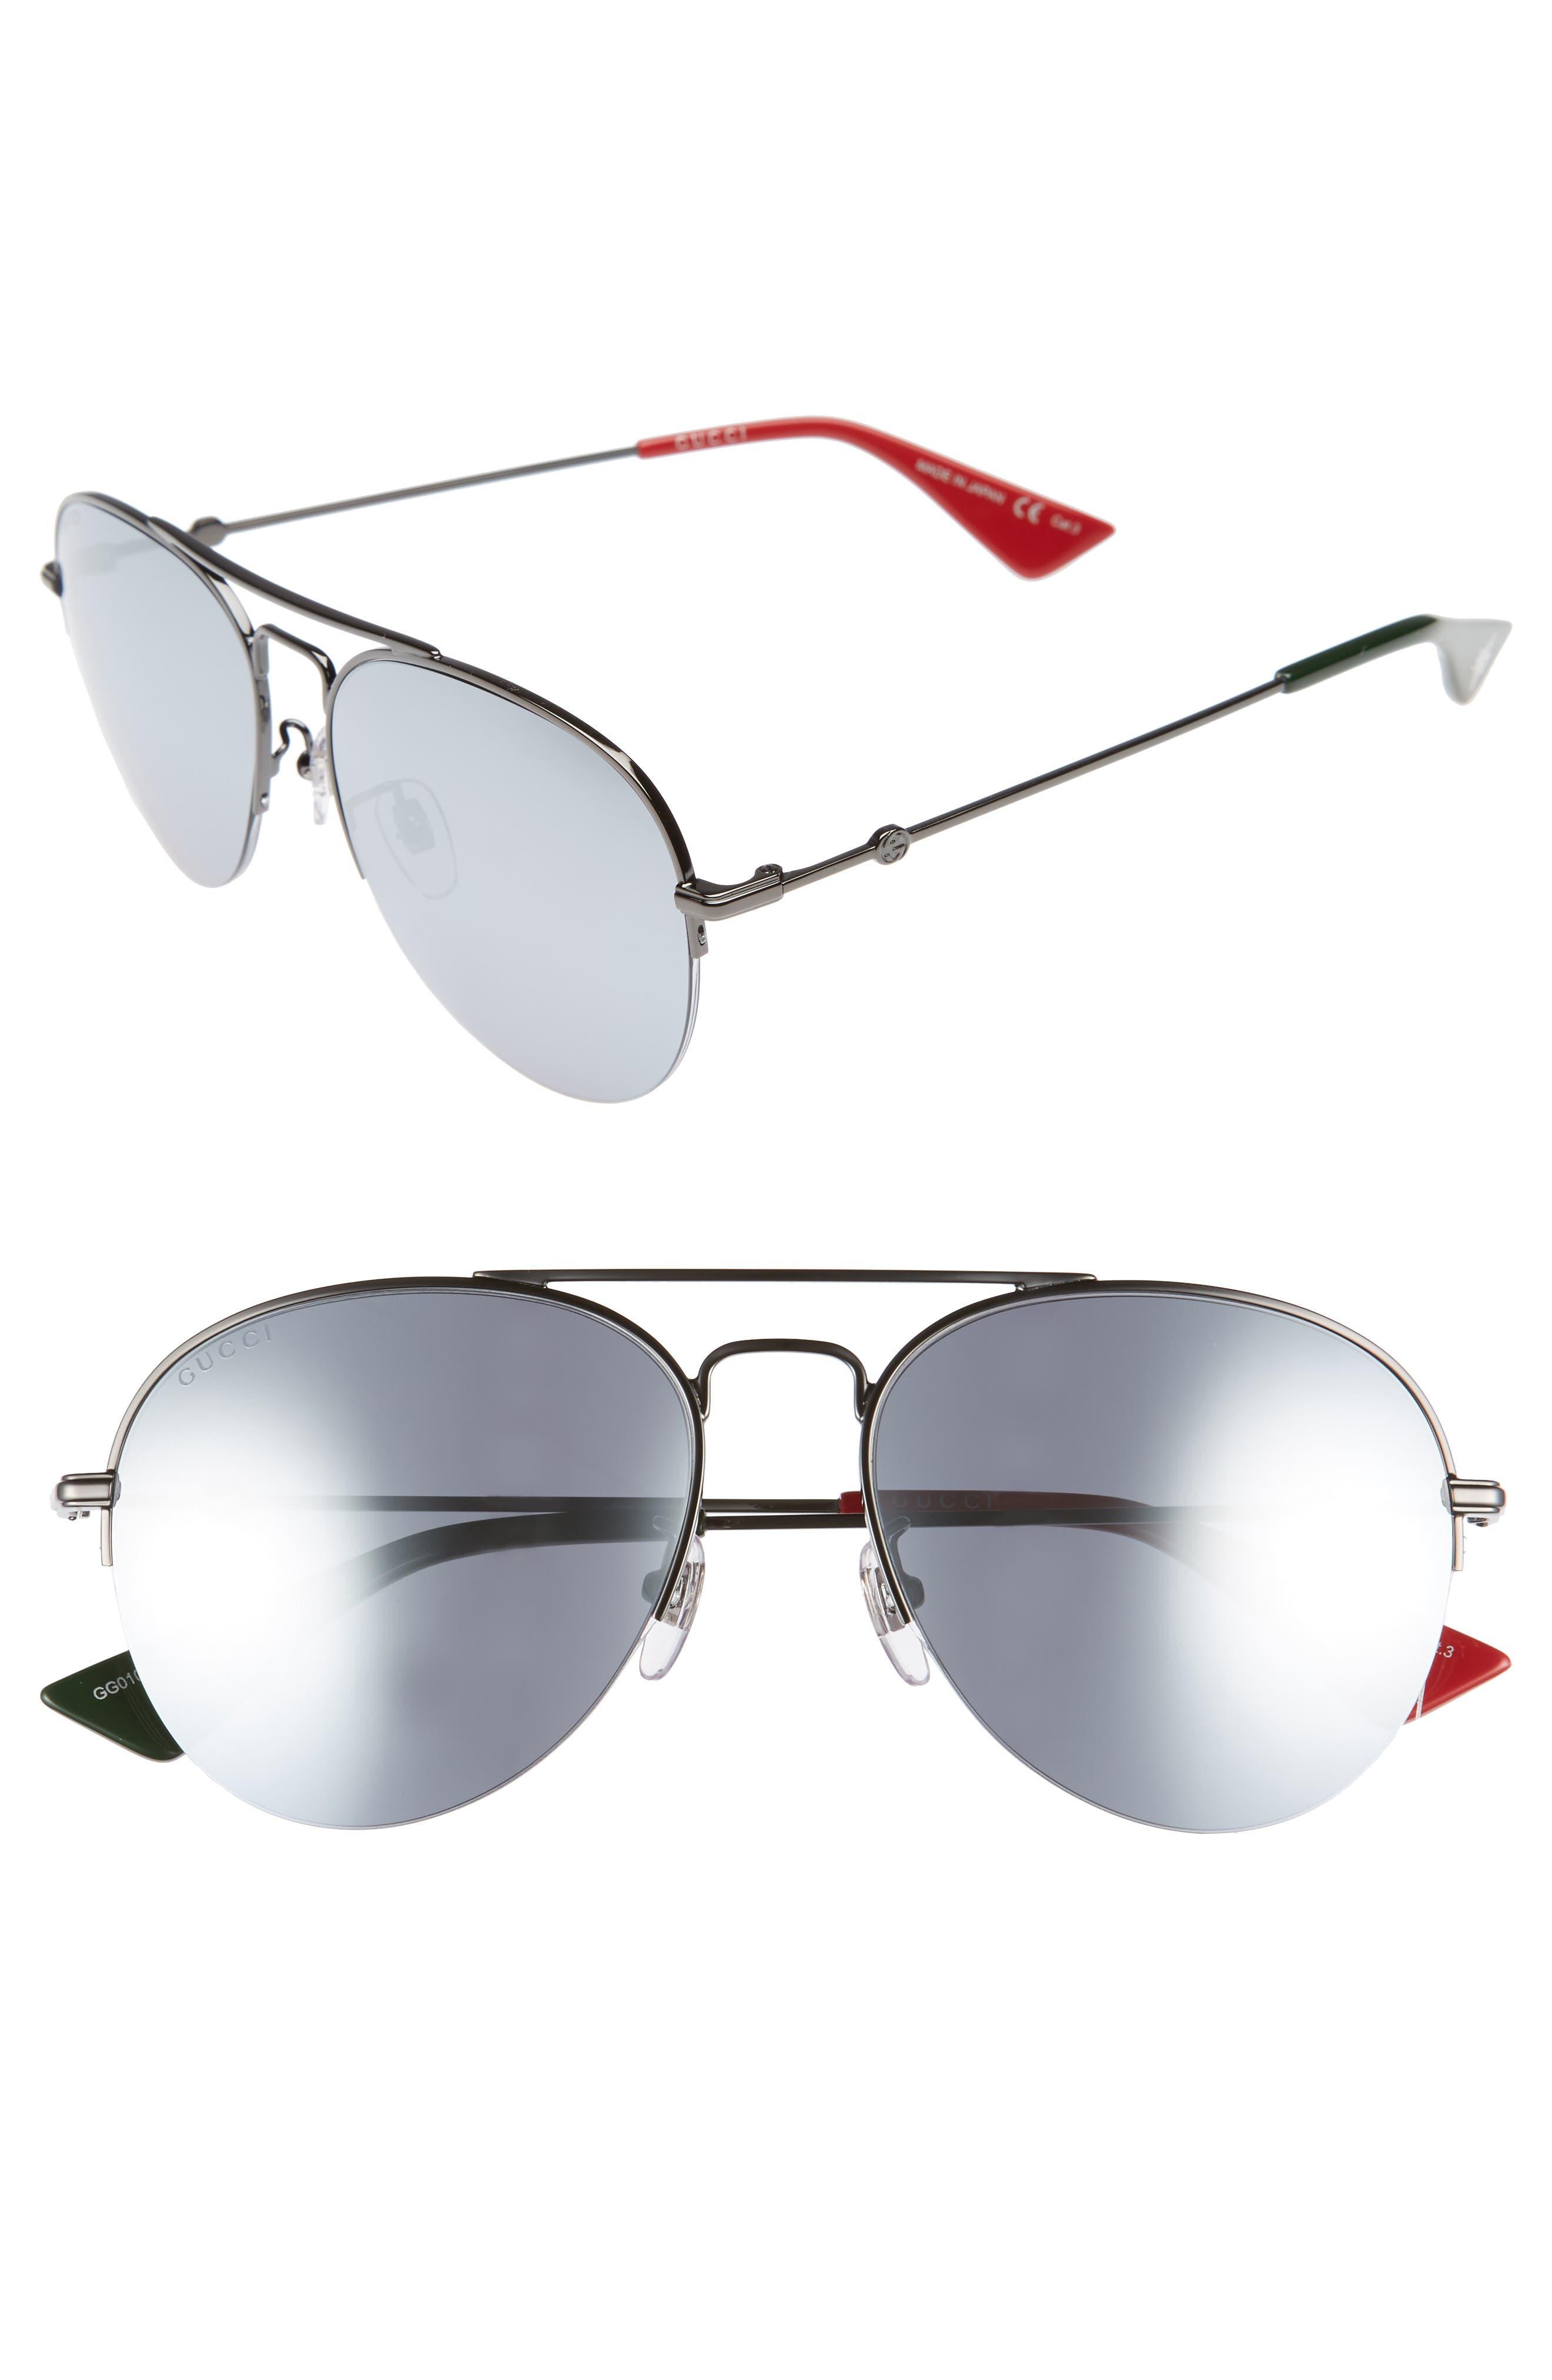 56mm Aviator Sunglasses,                             Main thumbnail 1, color,                             Ruthenium/ Silver